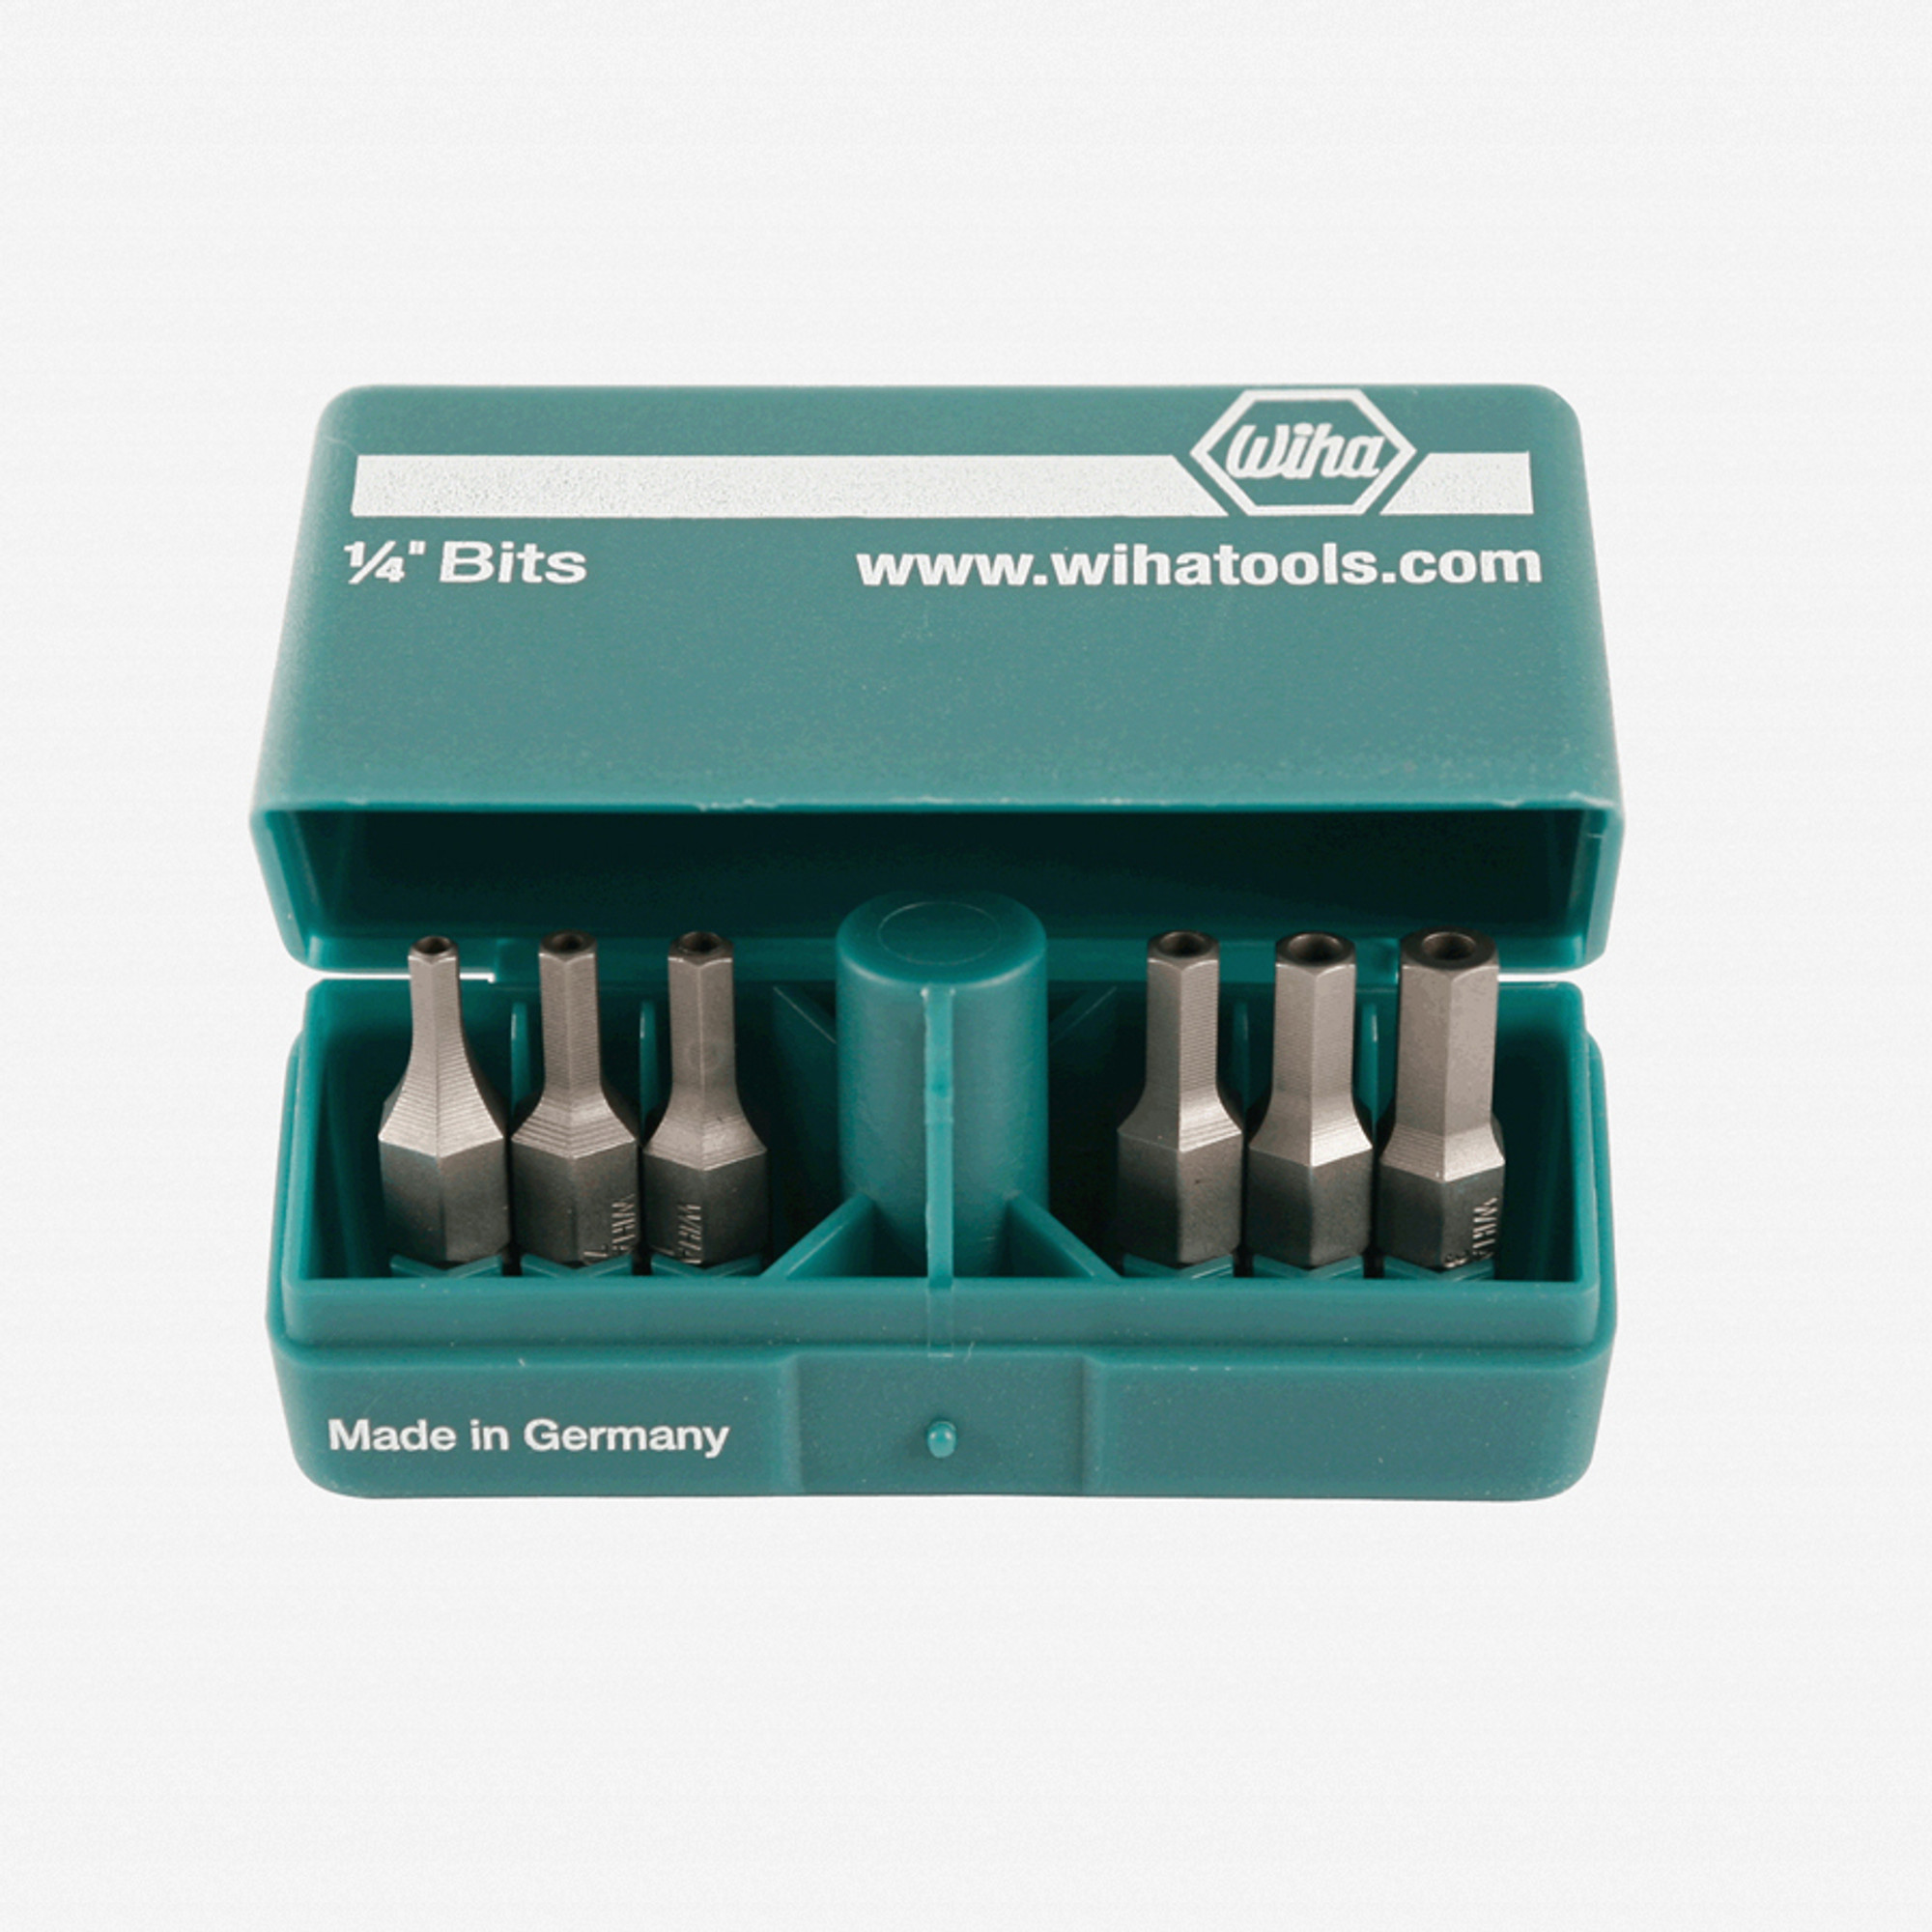 Wiha 33490 6 Piece Insulated Hex SAE T-handle Set